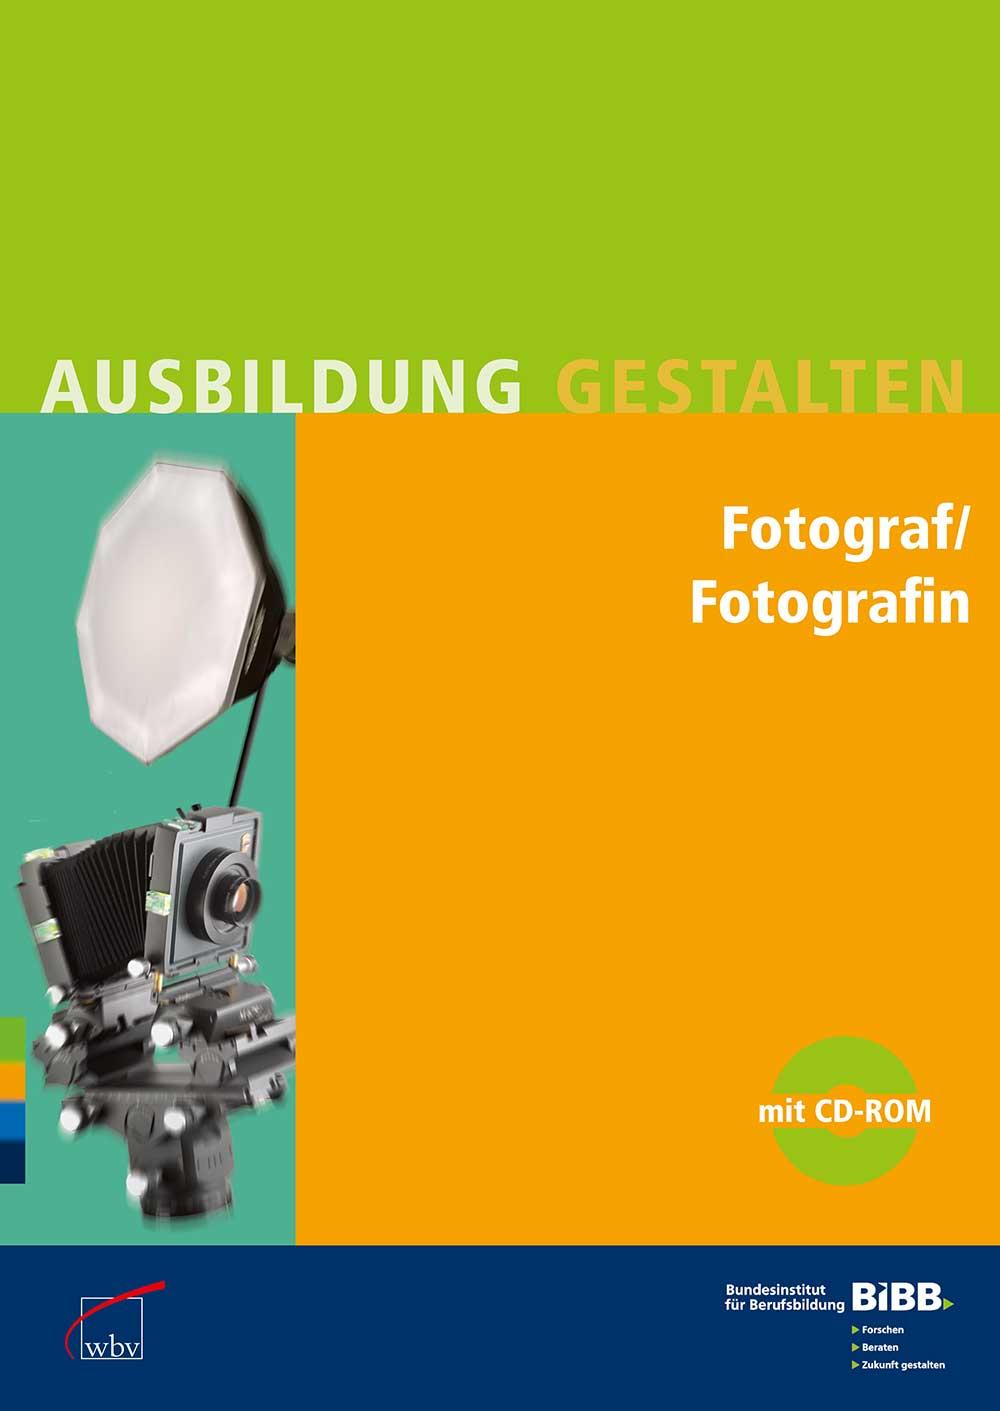 NEU Fotograf/Fotografin Bundesinstitut für Berufsbildung (BIBB) 942251